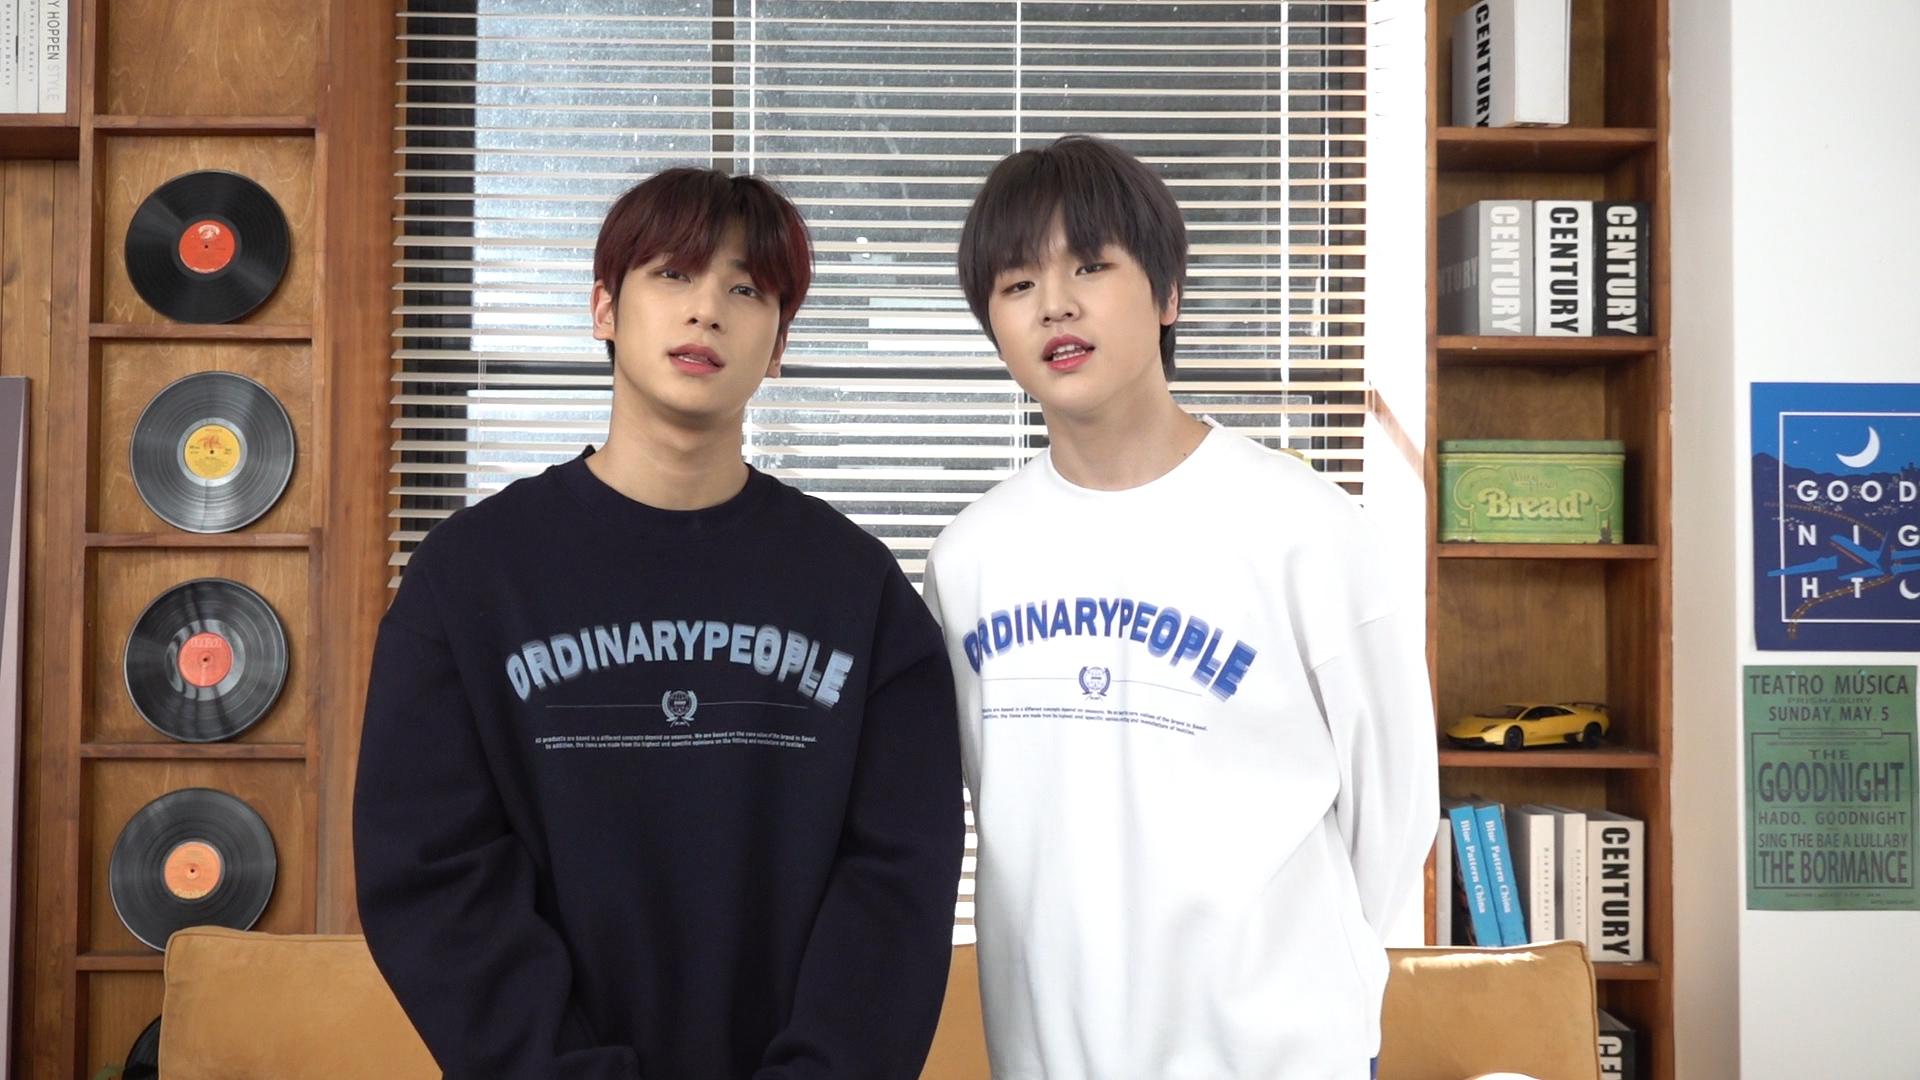 [H&D] 이한결&남도현(LEEHANGYUL&NAMDOHYON) 브이앱 인사말